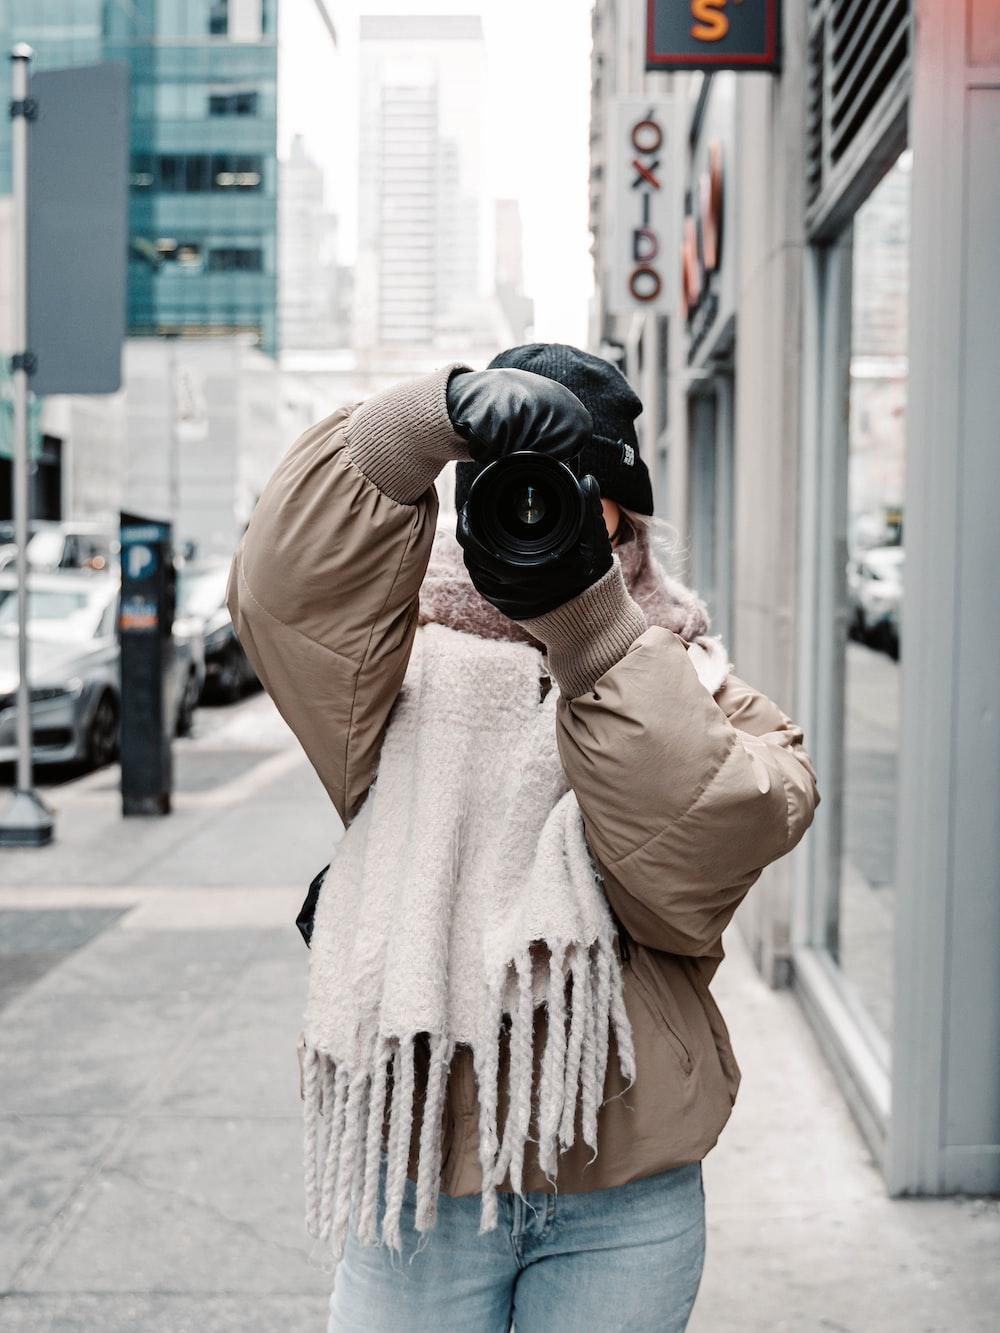 person in brown coat holding black dslr camera